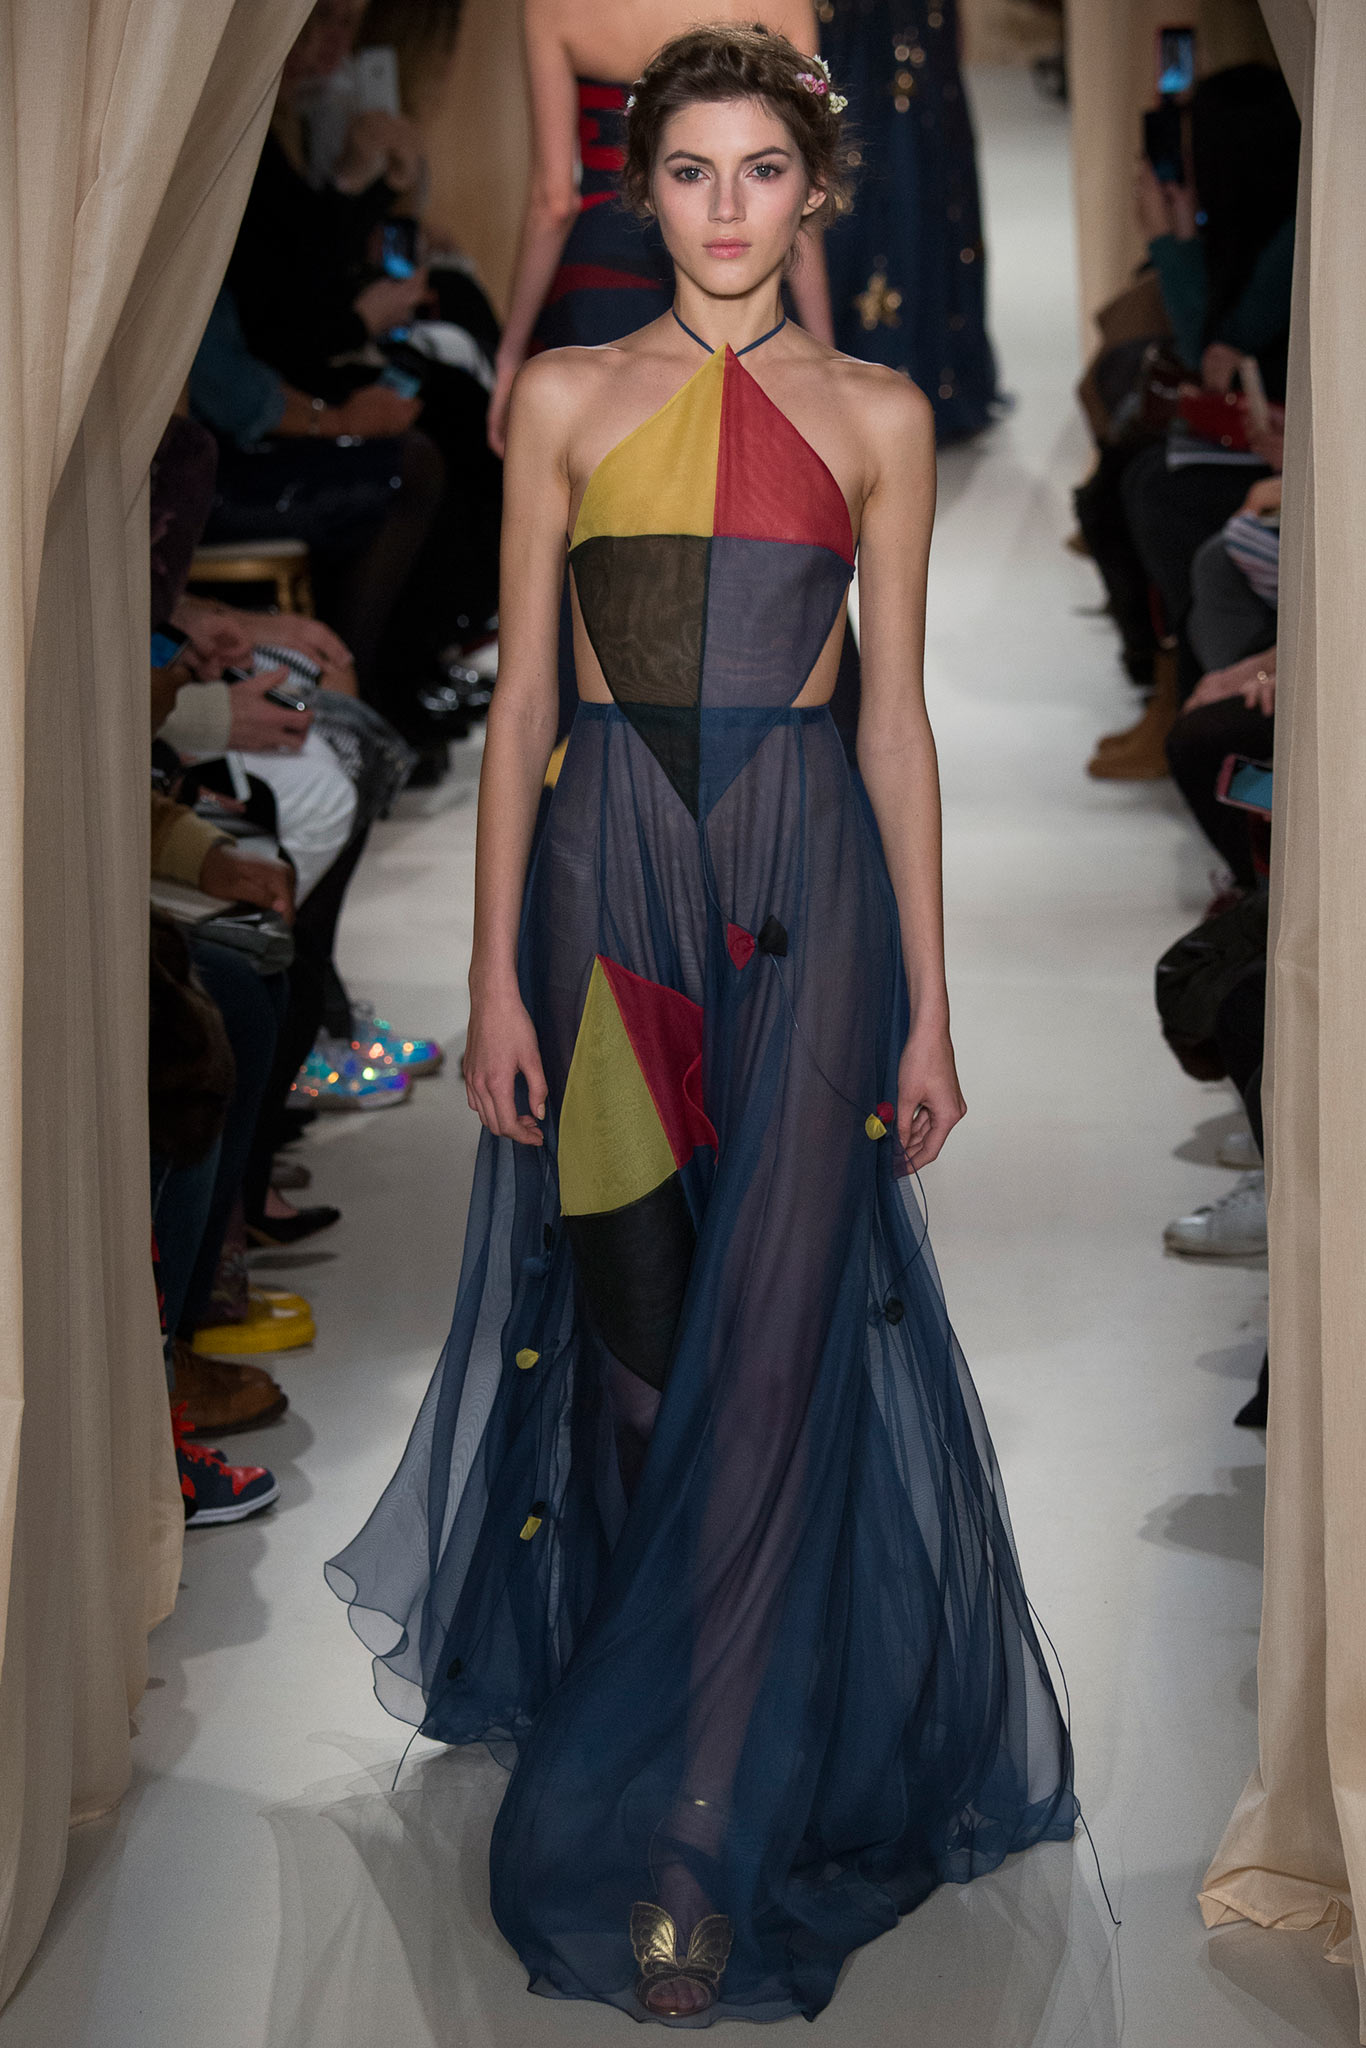 Valentino Haute Couture 2015 2 Самые носибельные образы с Недели моды haute couture в Париже